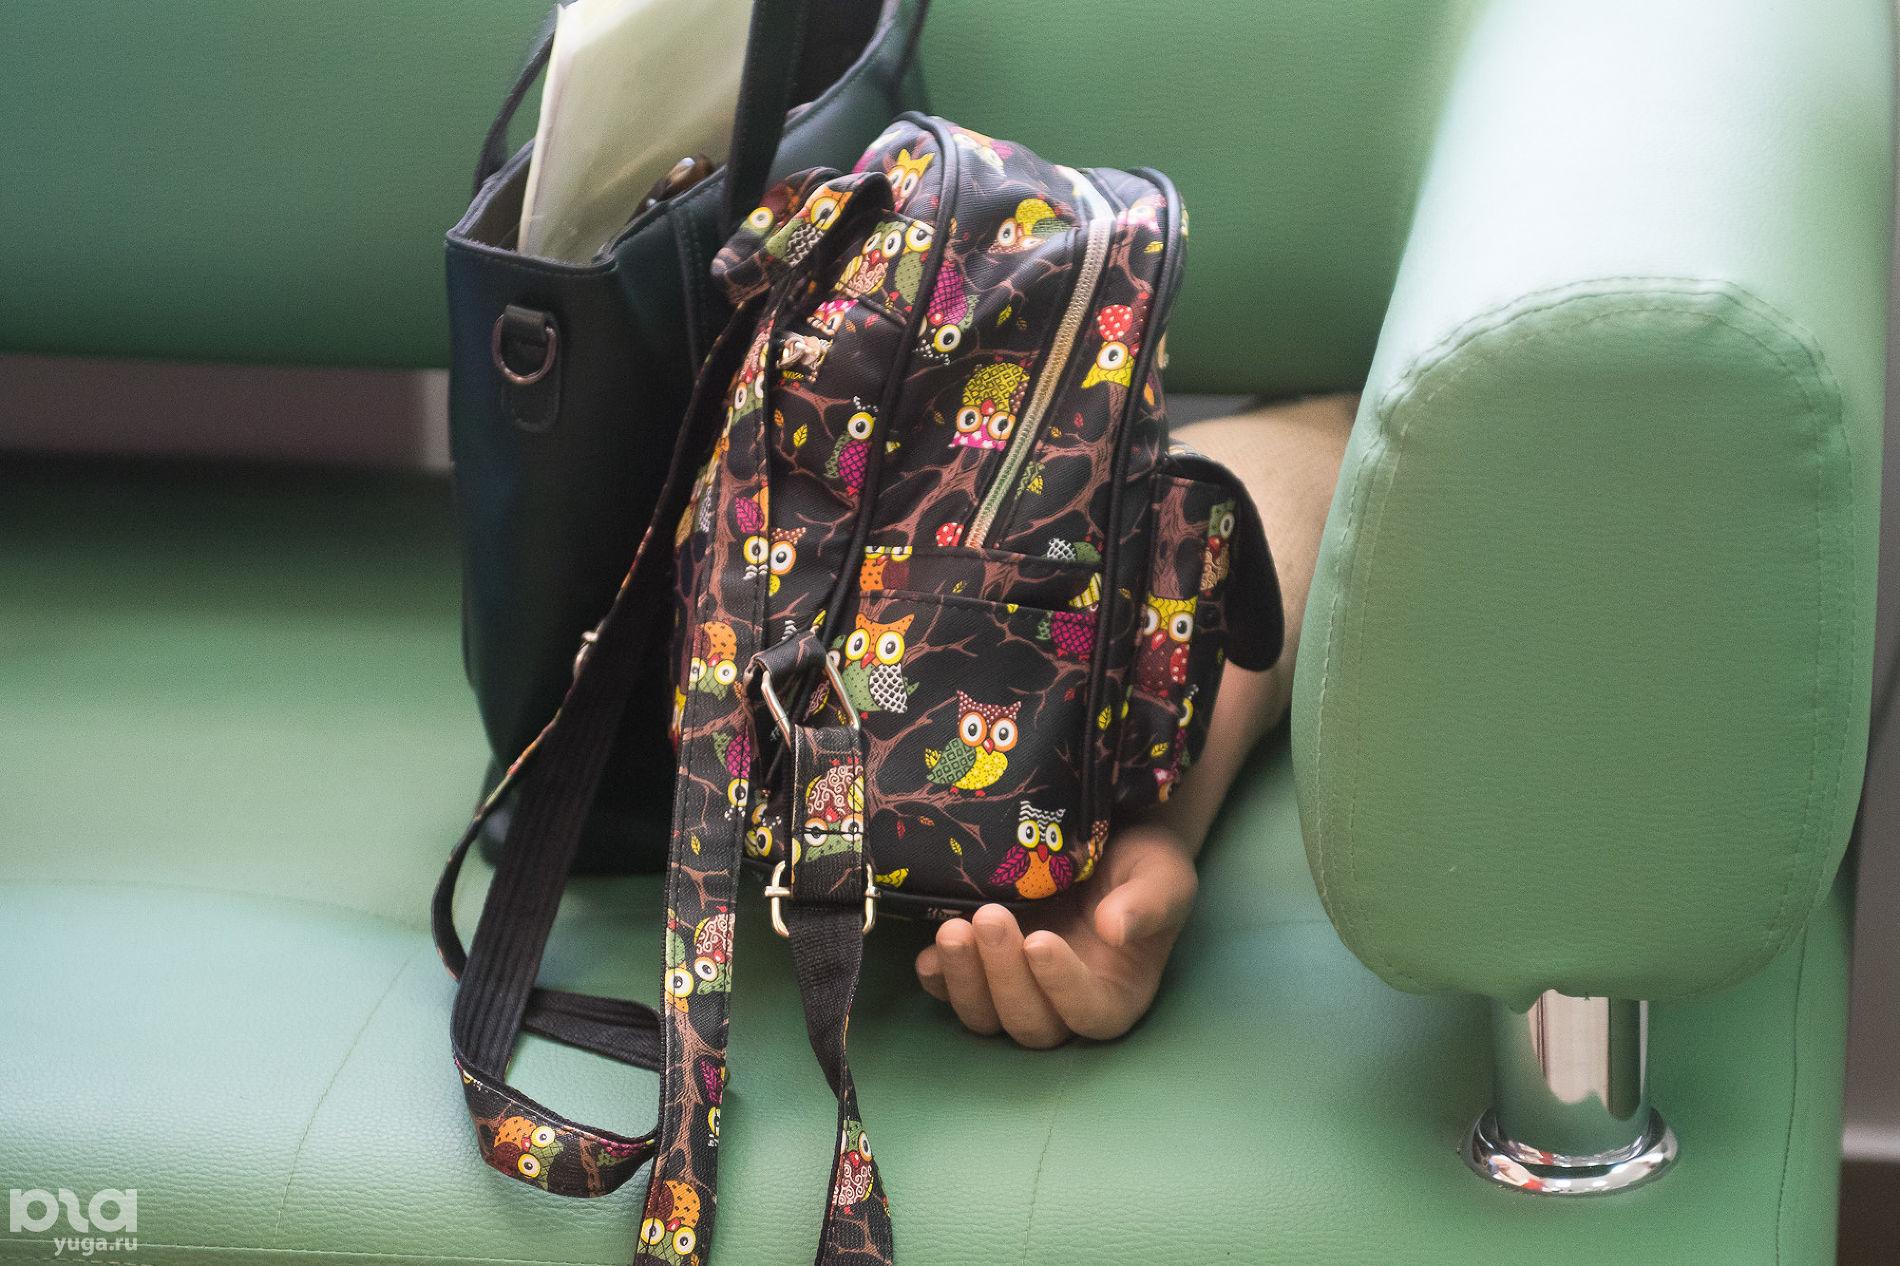 Косметический протез Даши © Фото Елены Синеок, Юга.ру